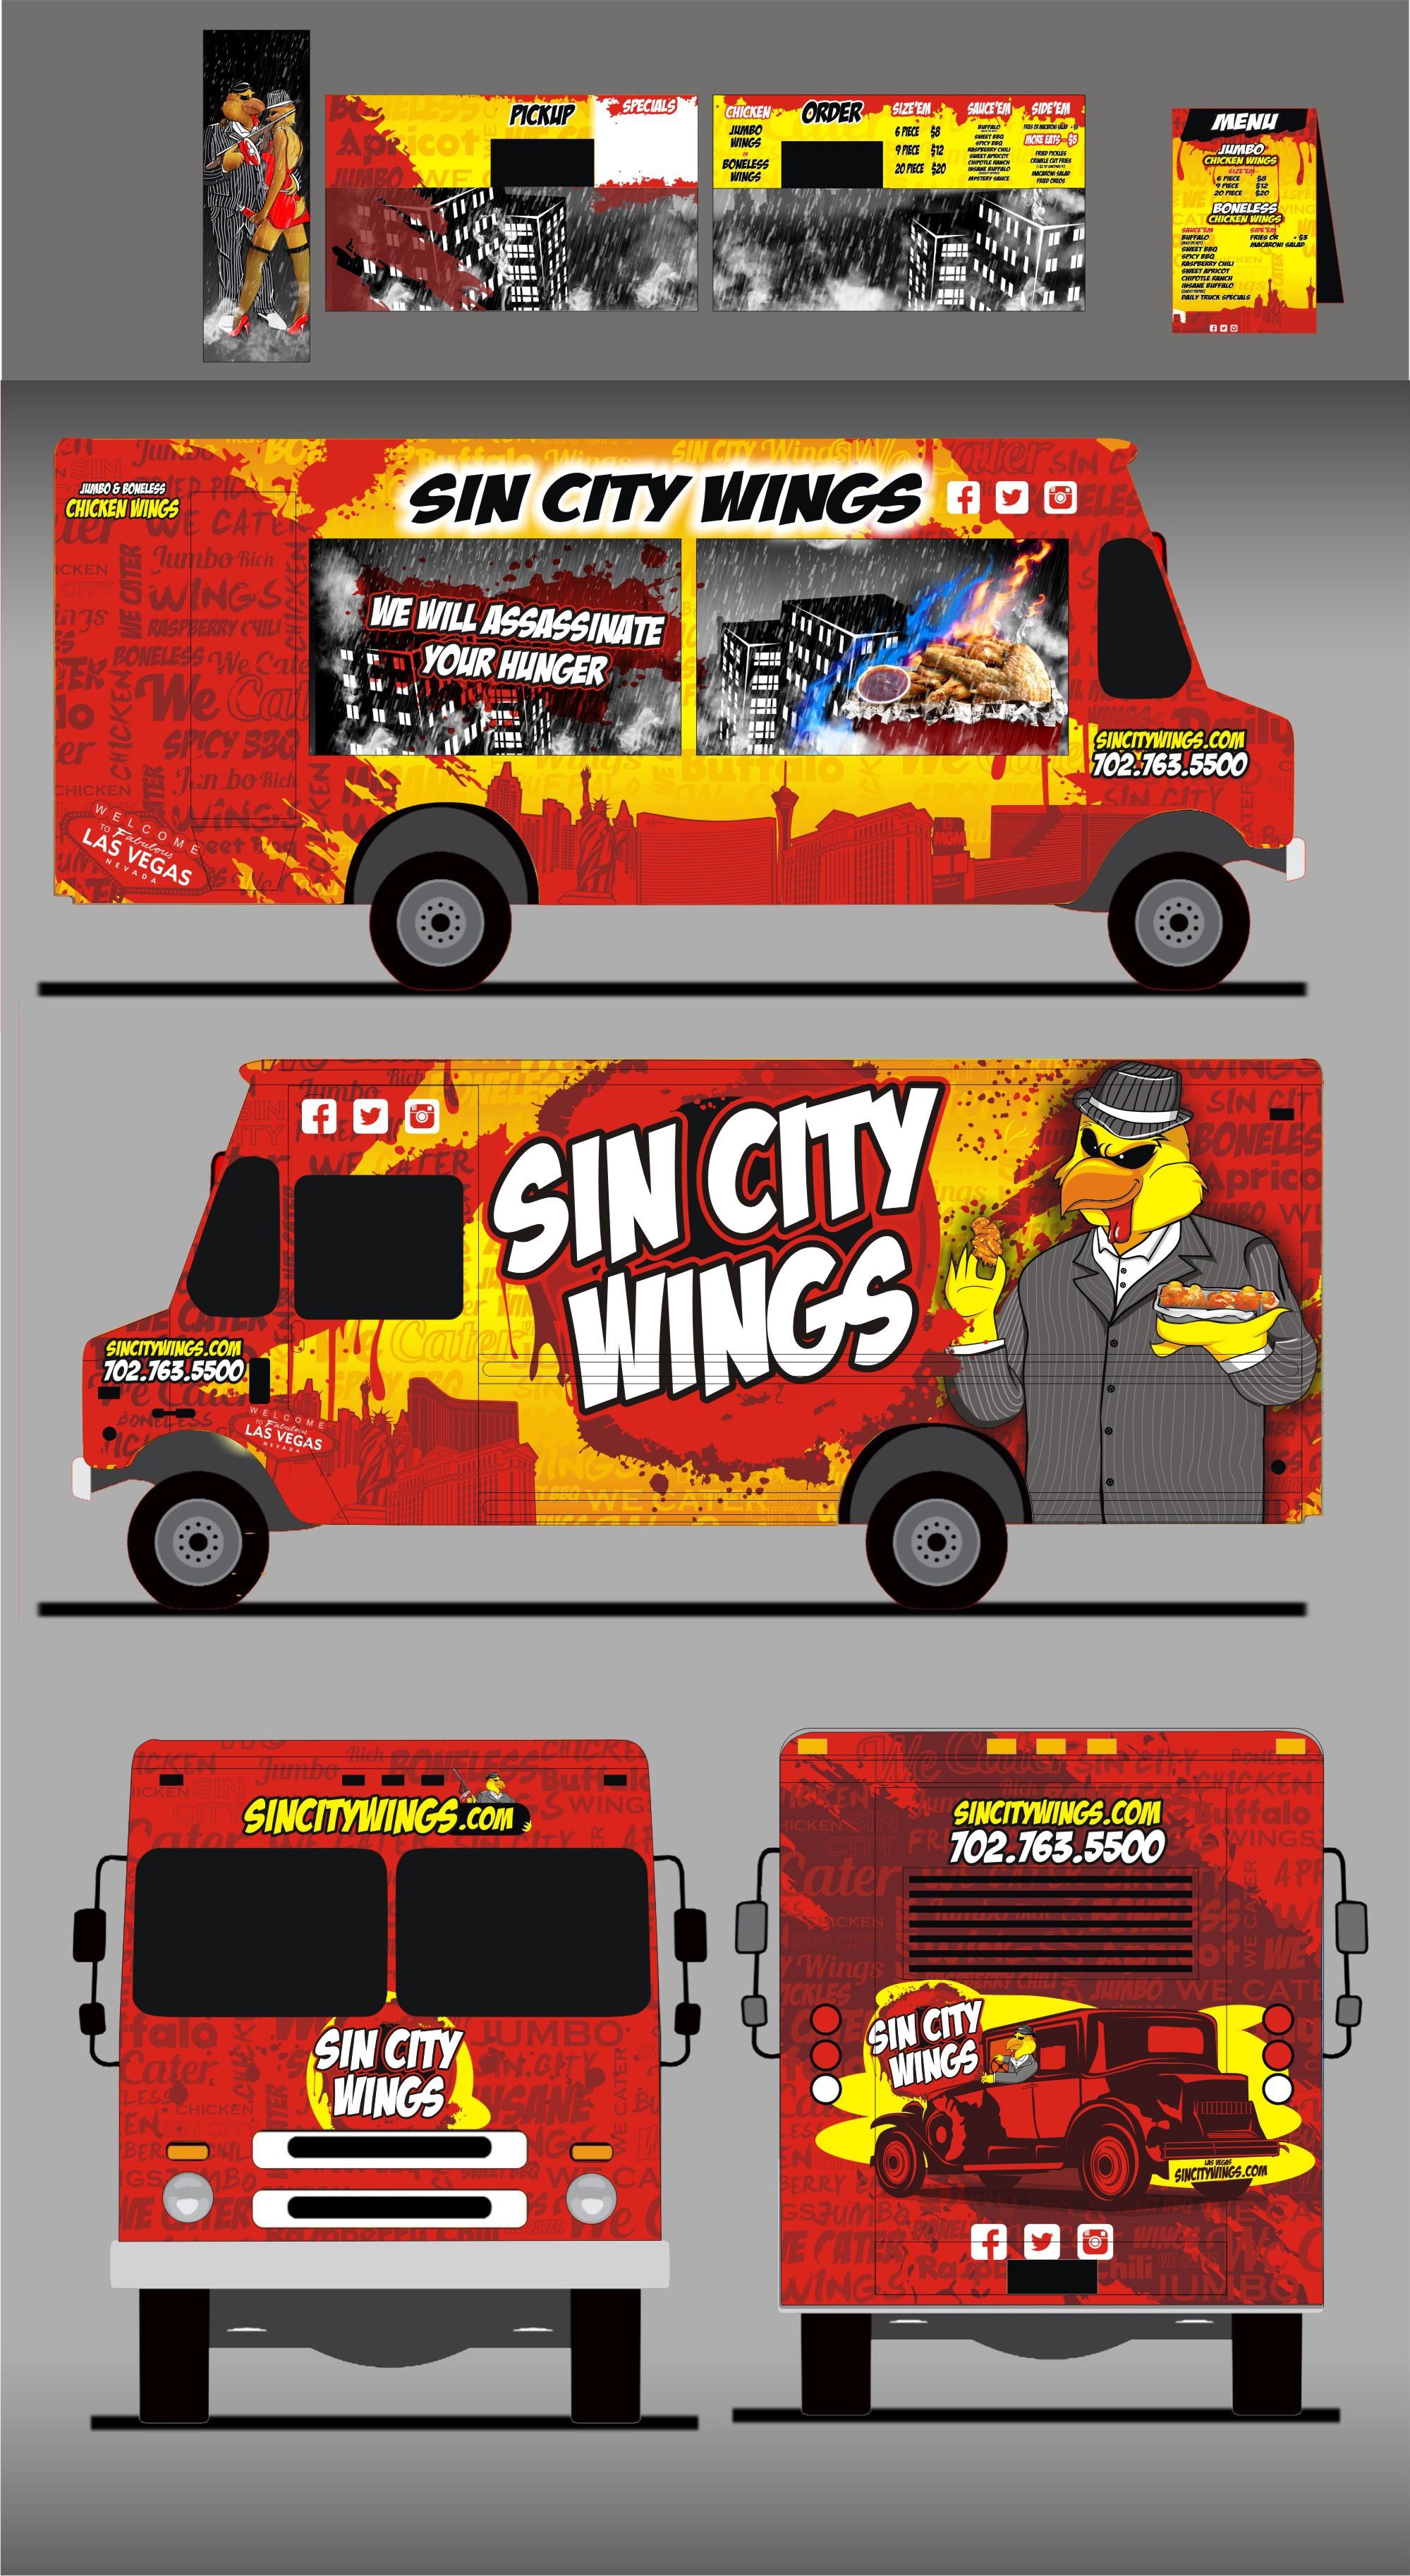 Sin City Wings - Food truck wrap for Las Vegas based truck